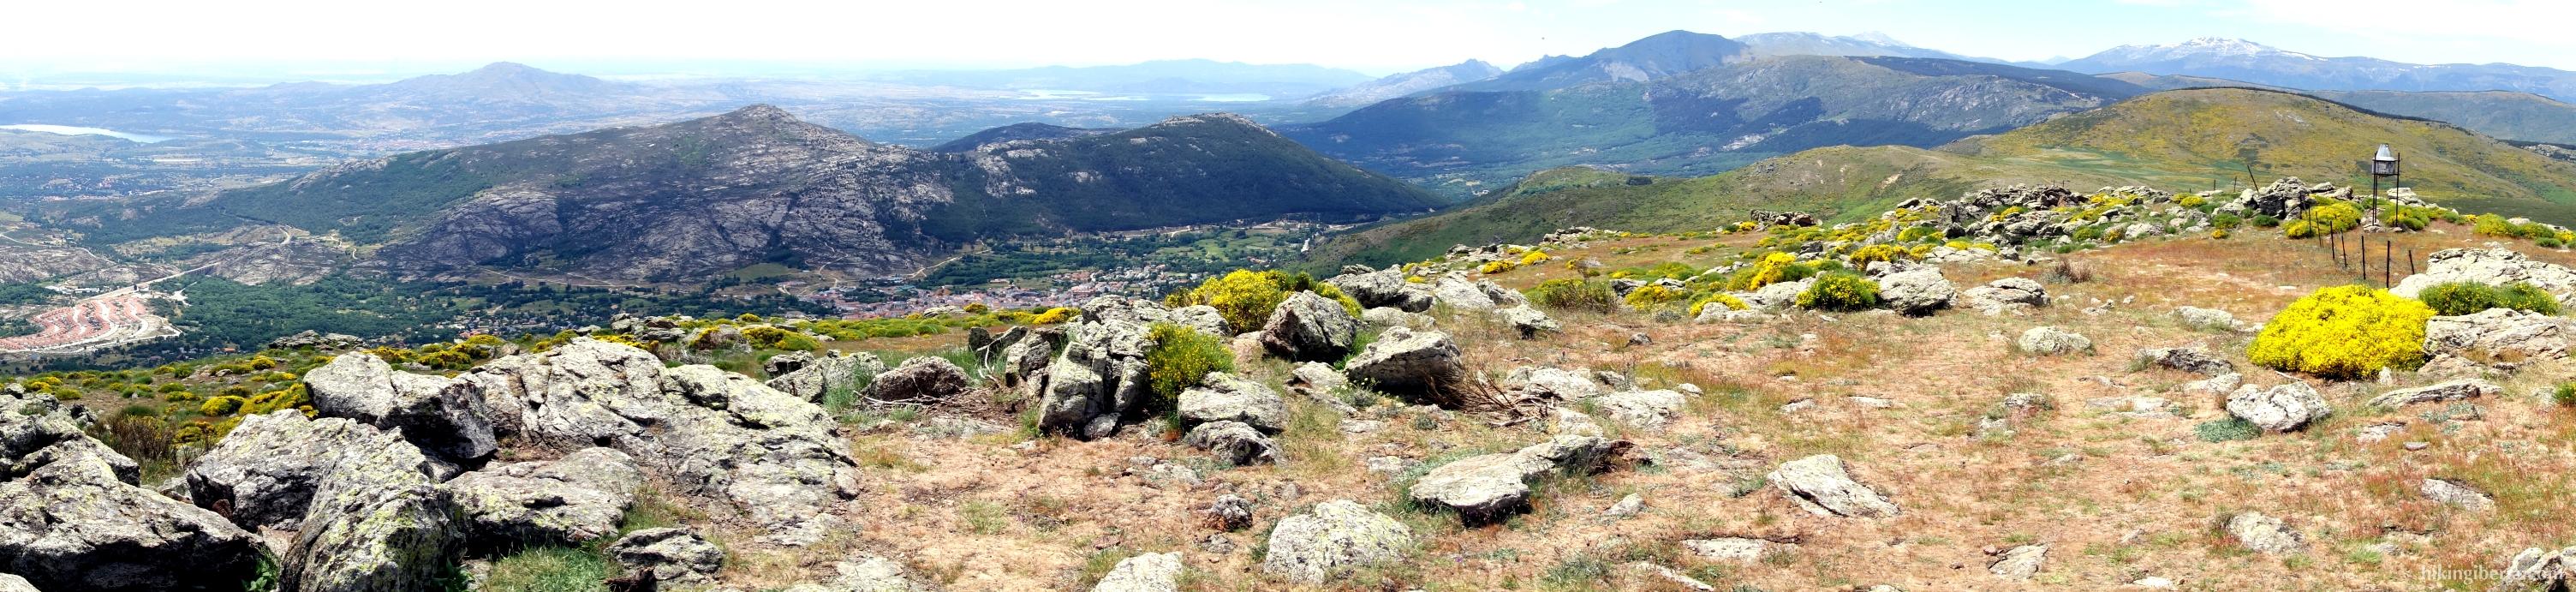 Mondalindo (short route)